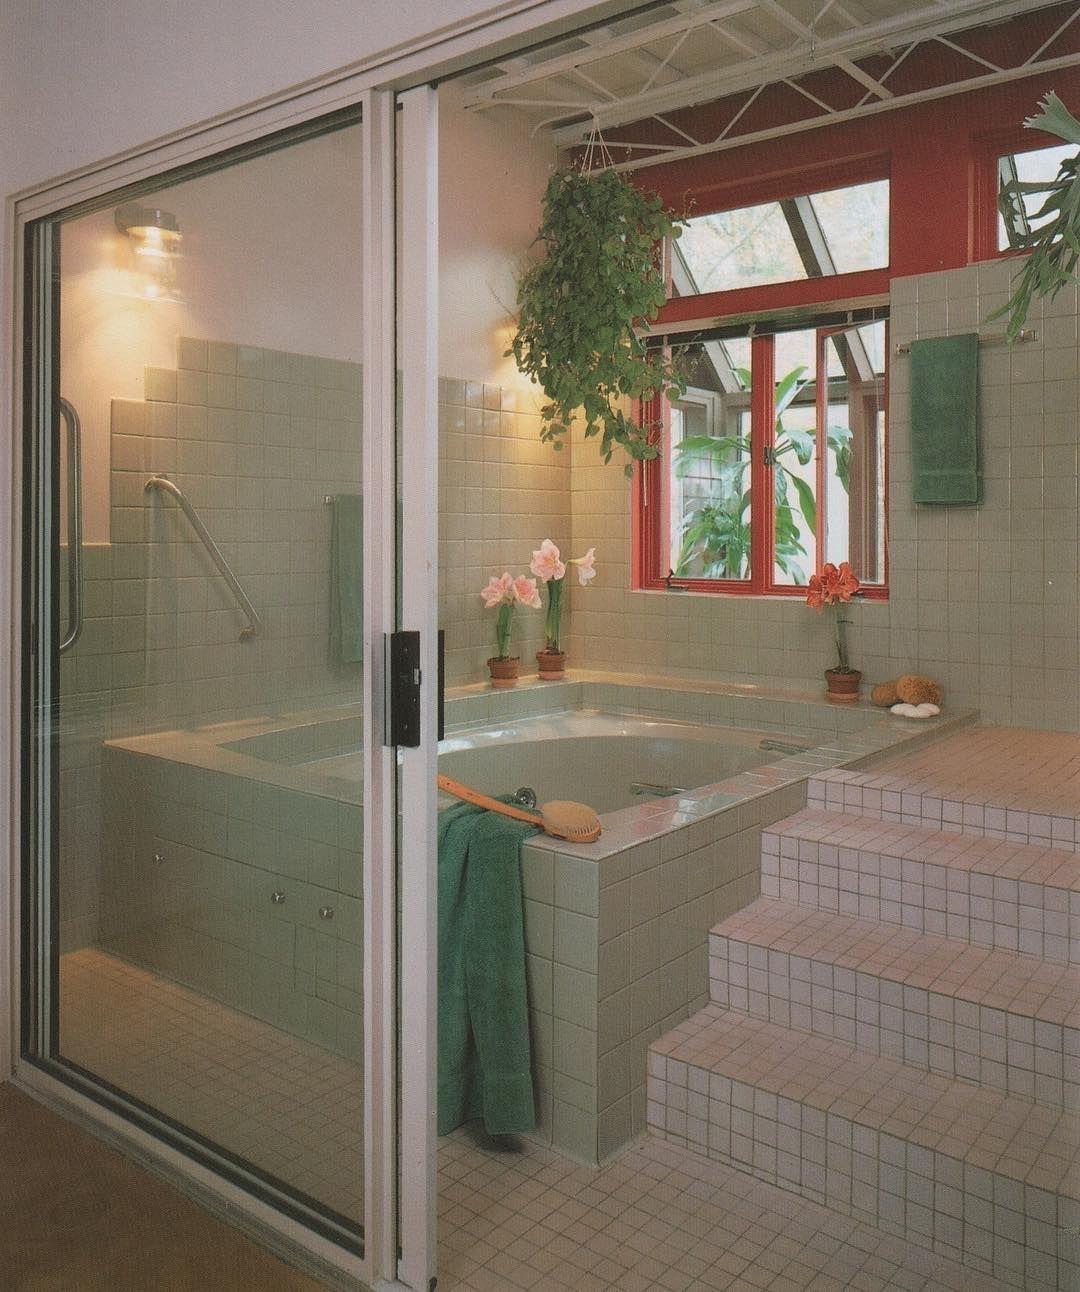 Bath design interiors also best dreamy images on pinterest vintage rh